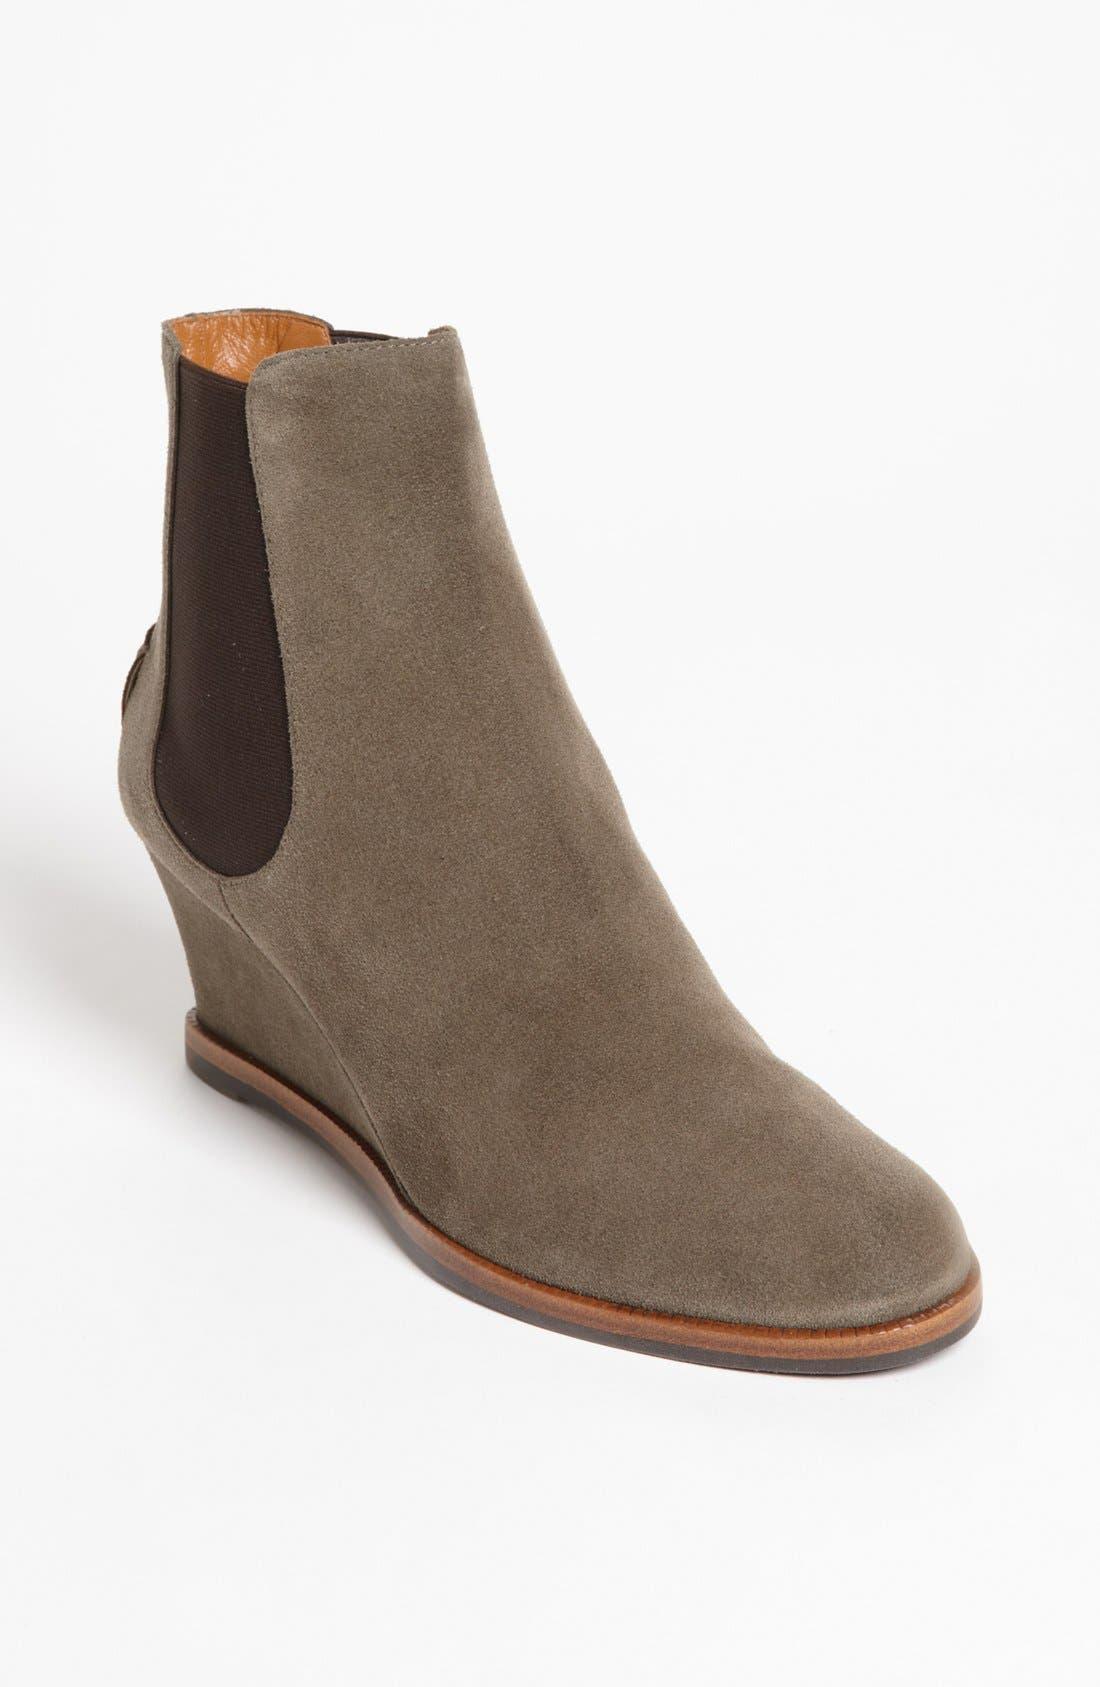 Alternate Image 1 Selected - Fendi Wedge Ankle Boot